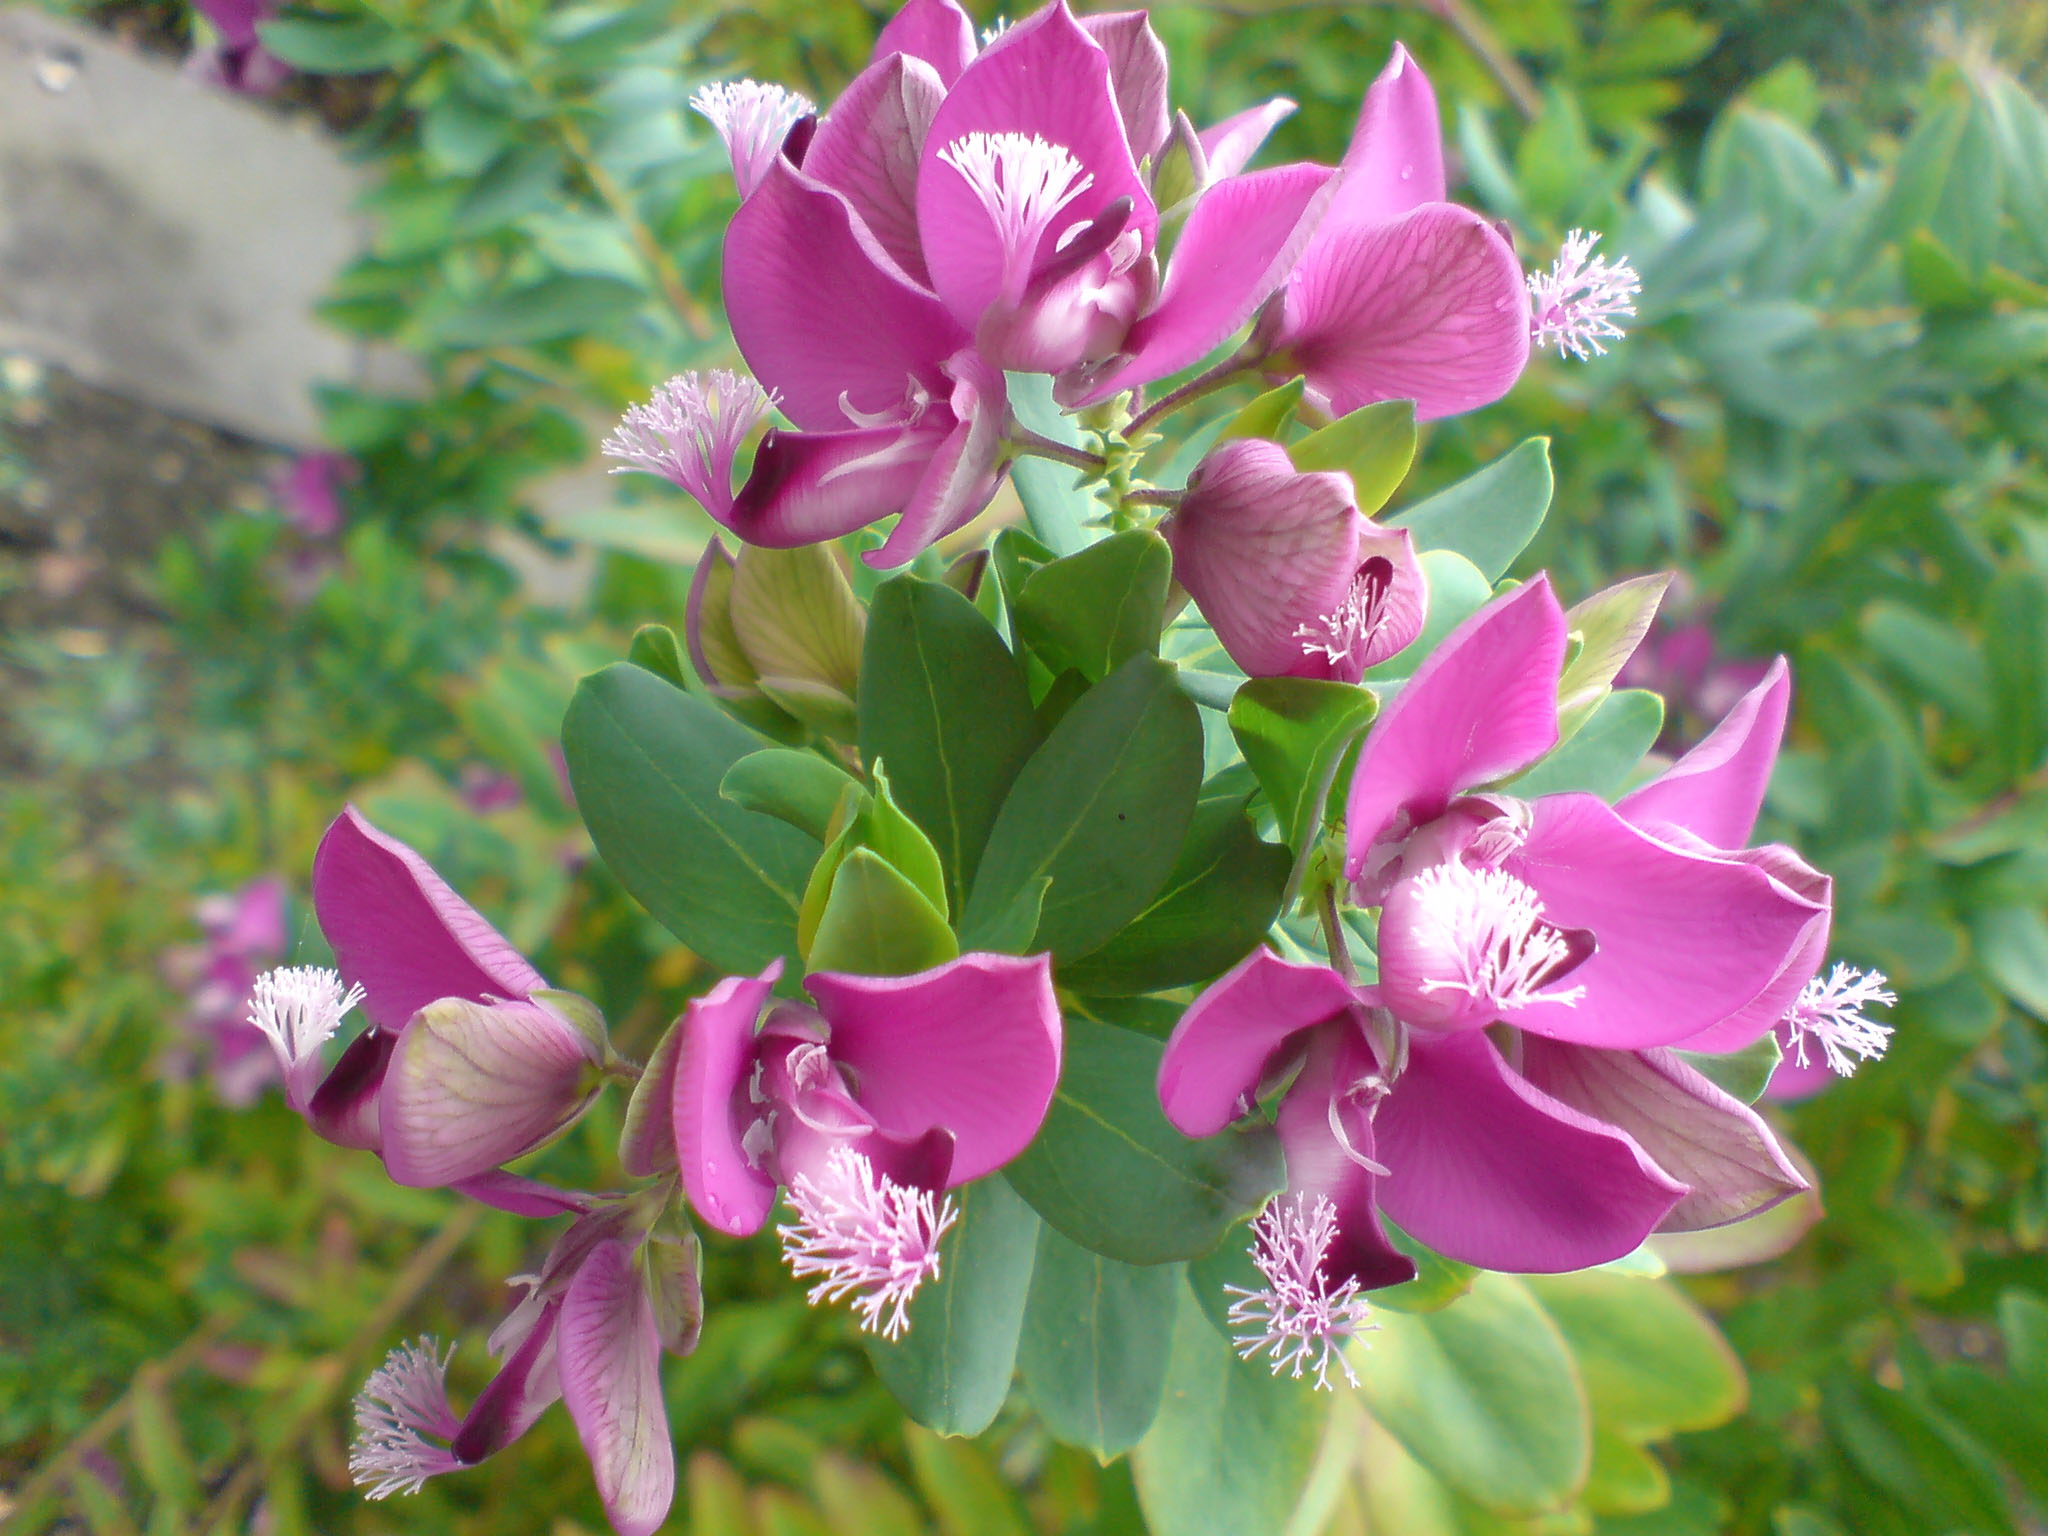 File:Polygala myrtifolia (var. grandiflora)-1.JPG - Wikimedia Commons